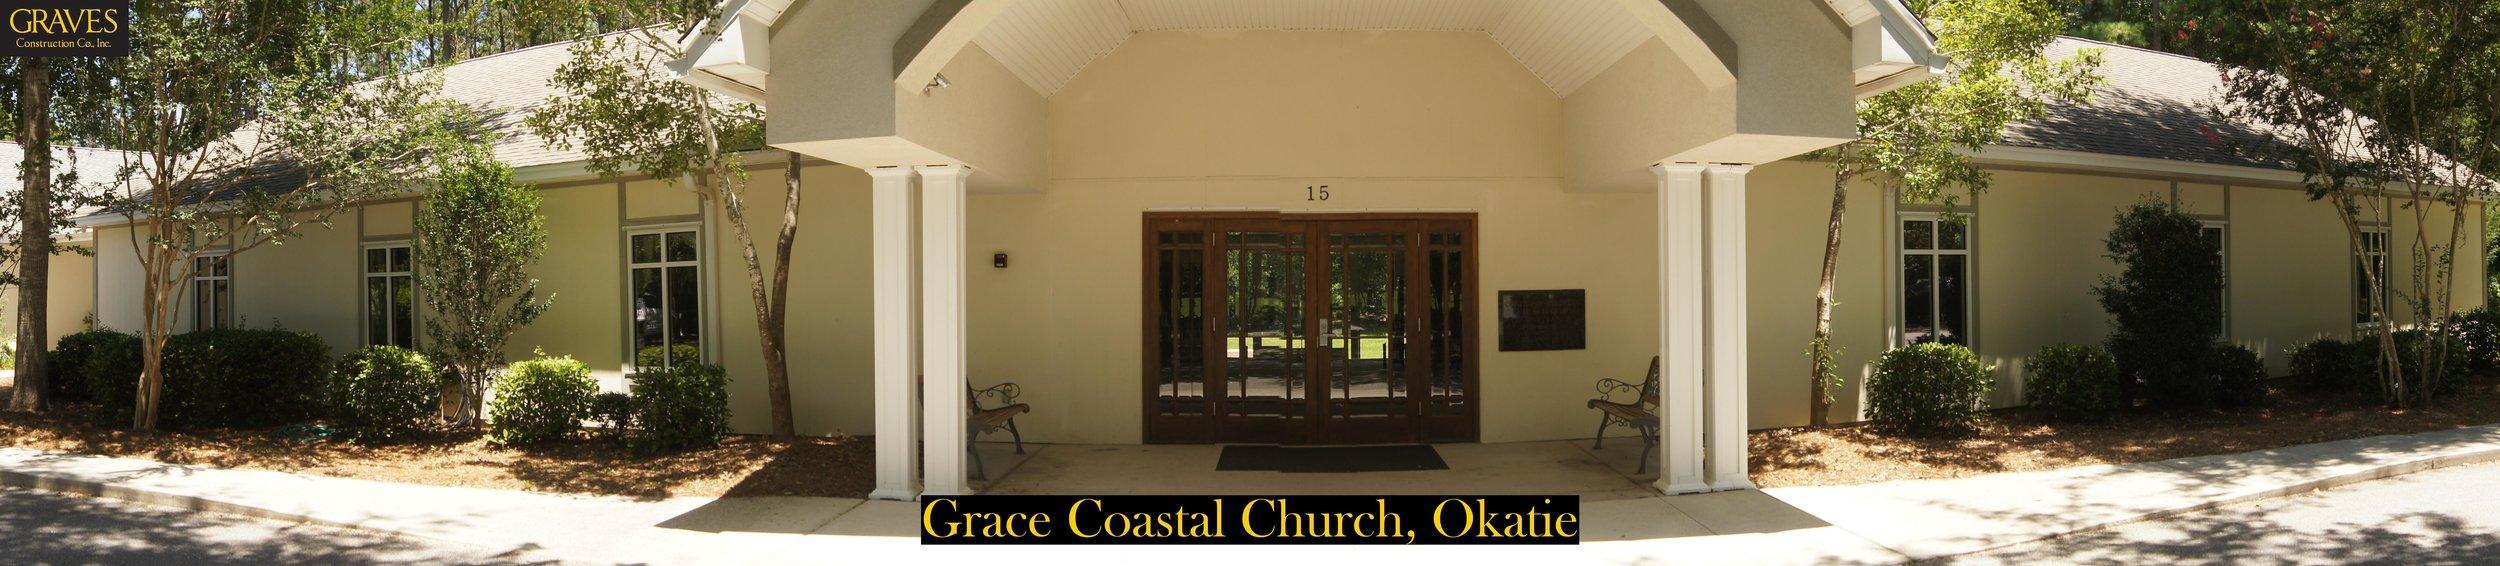 Grace Coastal Church - 5